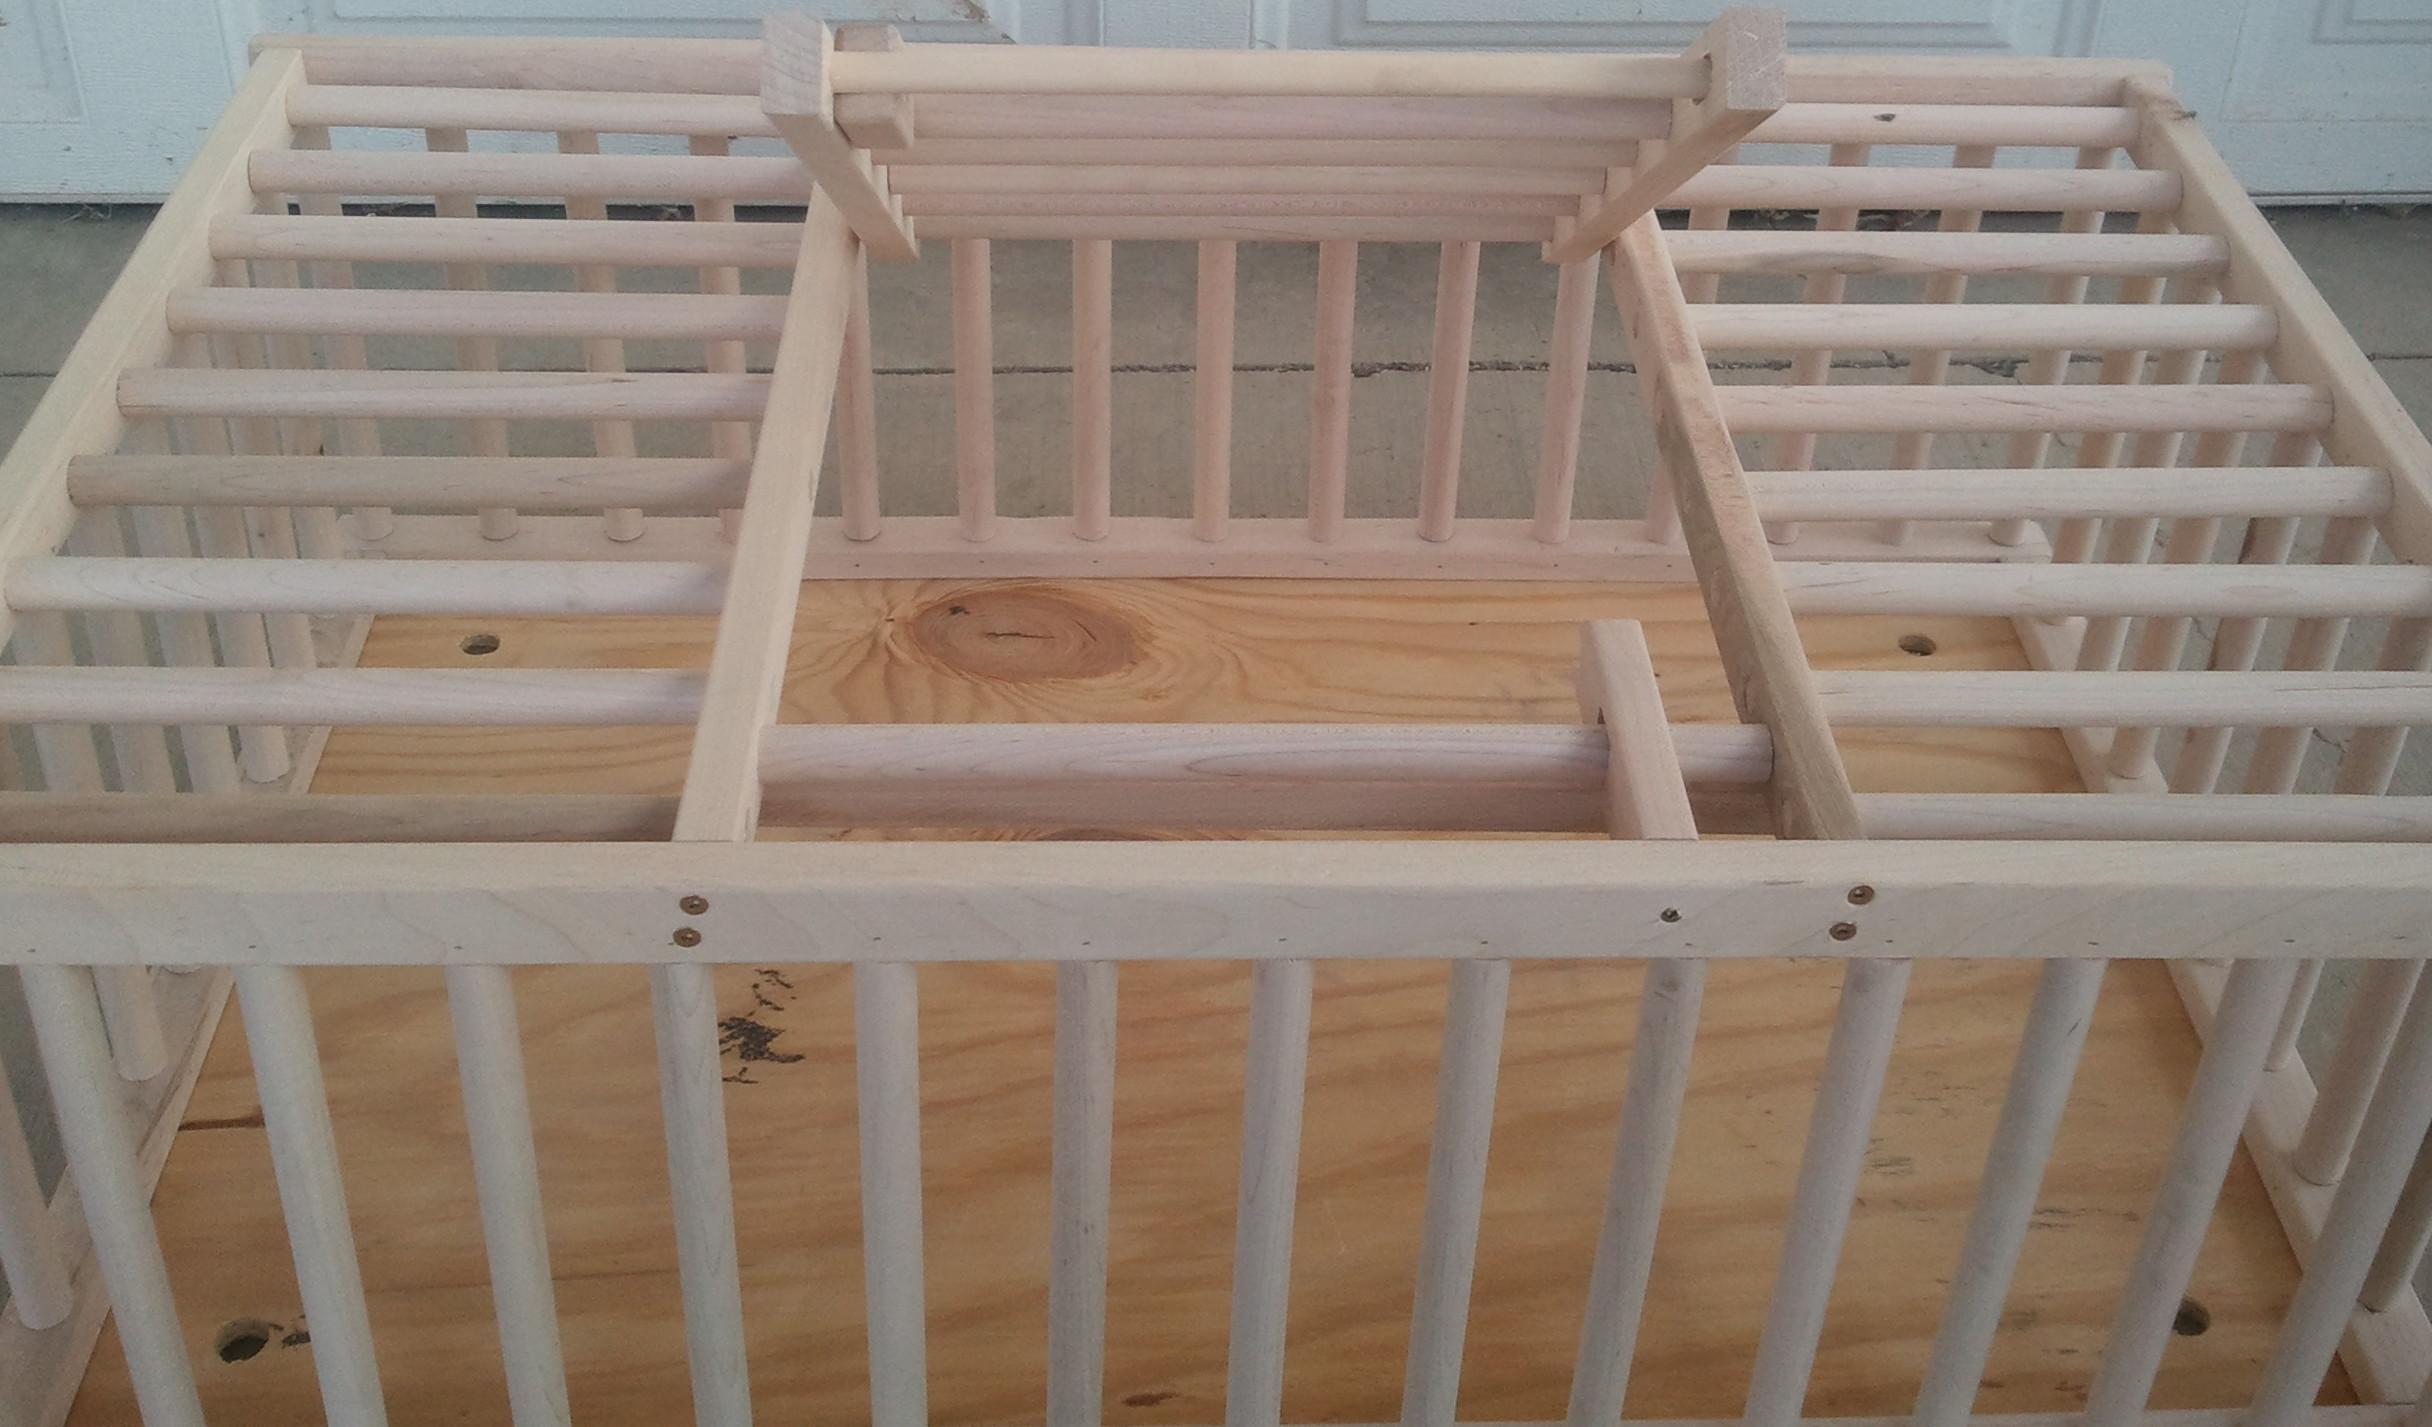 Wooden Chicken Crate Plans